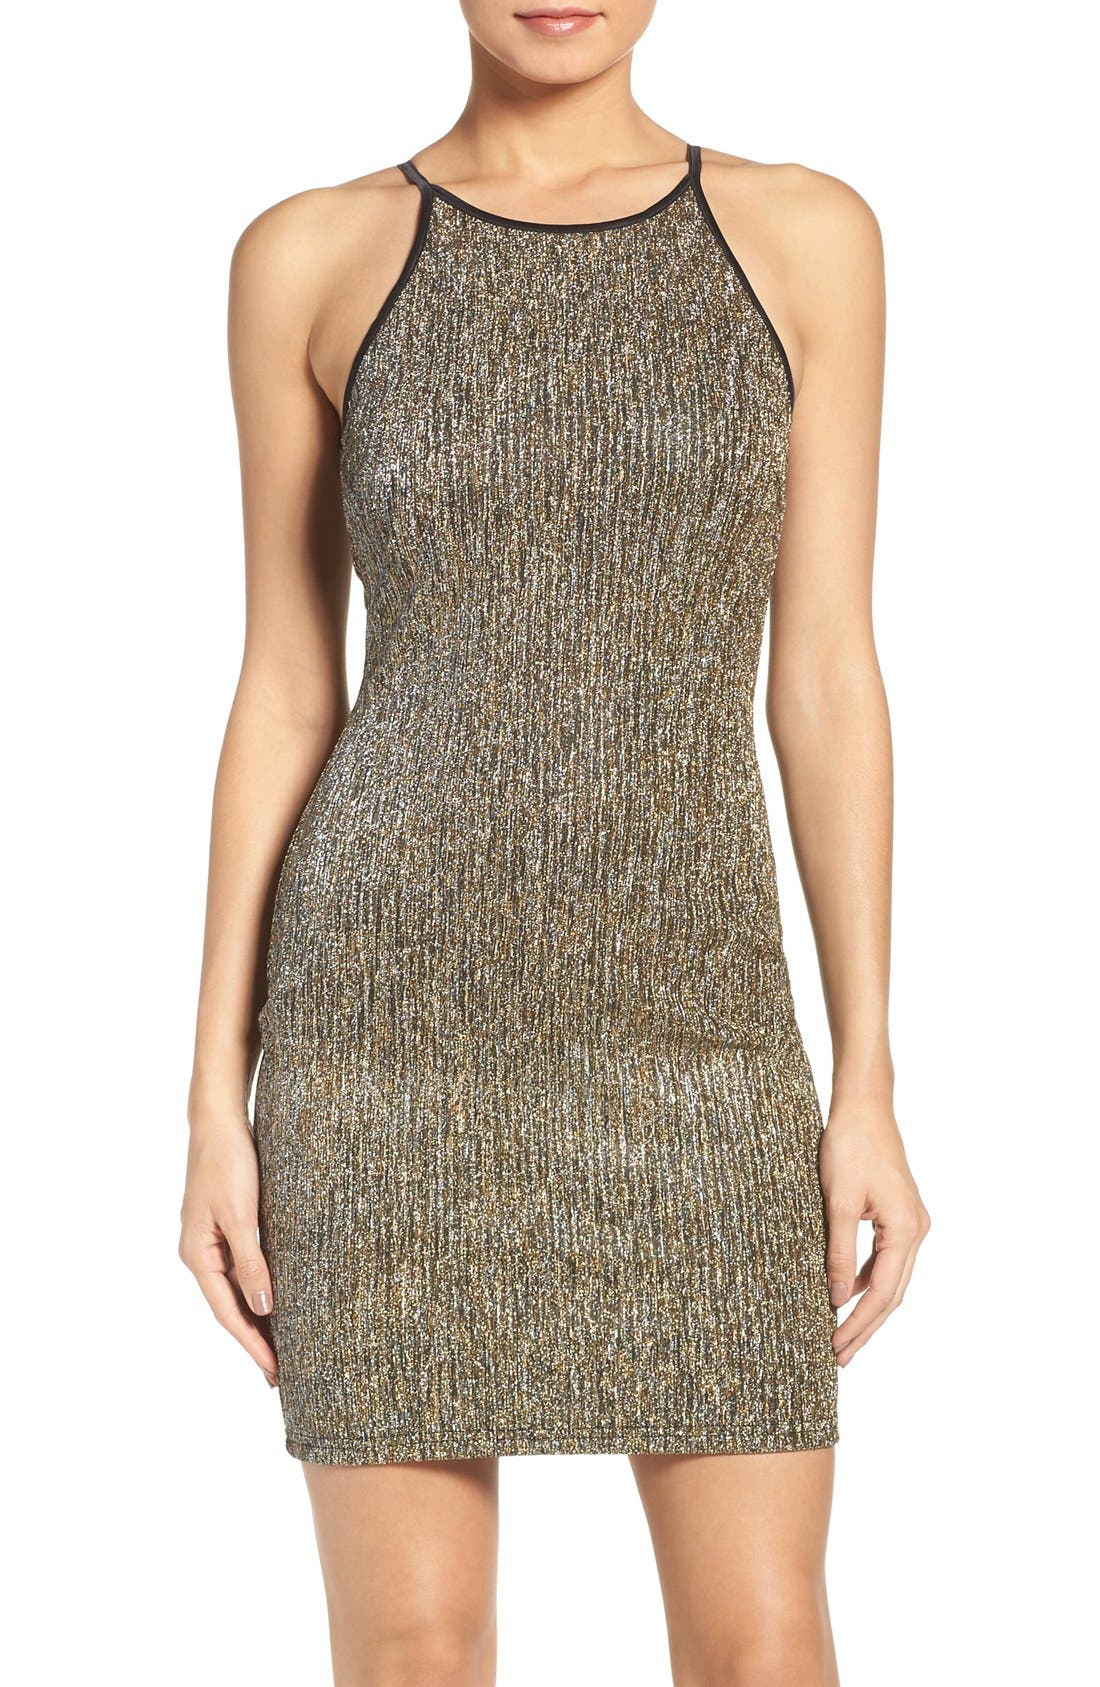 Alternate Image 1 Selected - Gerylin Metallic Knit Body-Con Dress